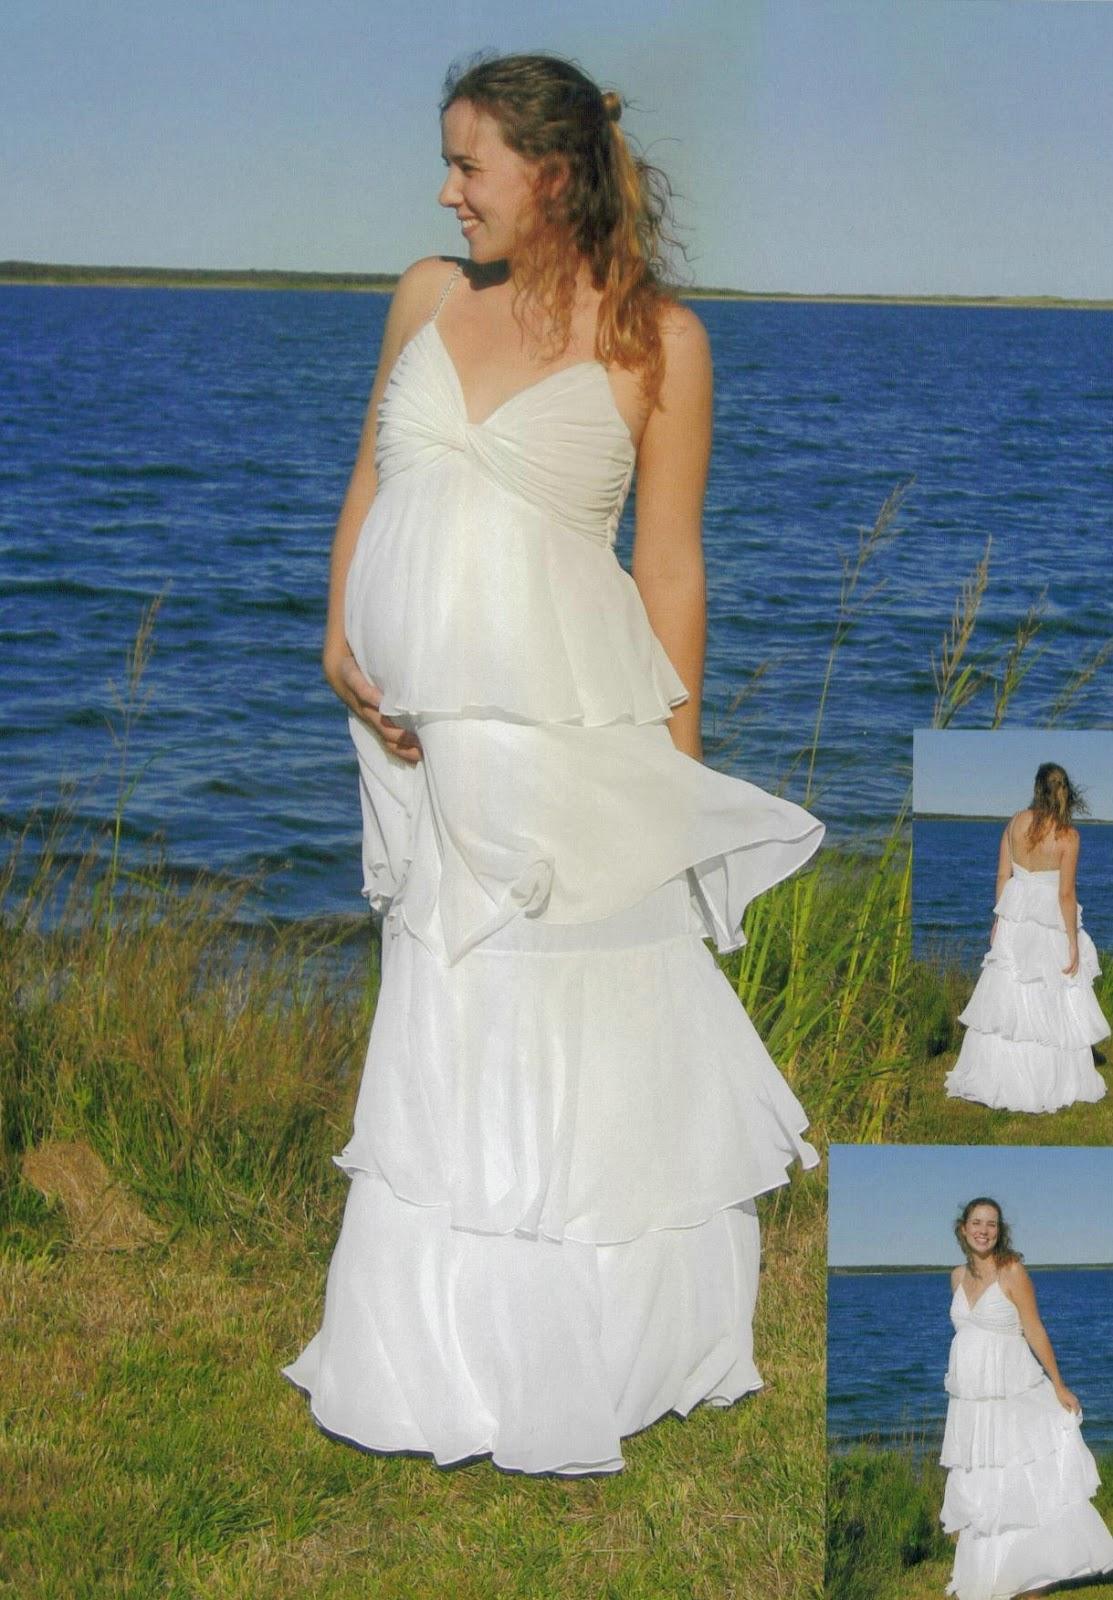 WhiteAzalea Maternity Dresses Are You Ready For A Maternity Autumn Wedding